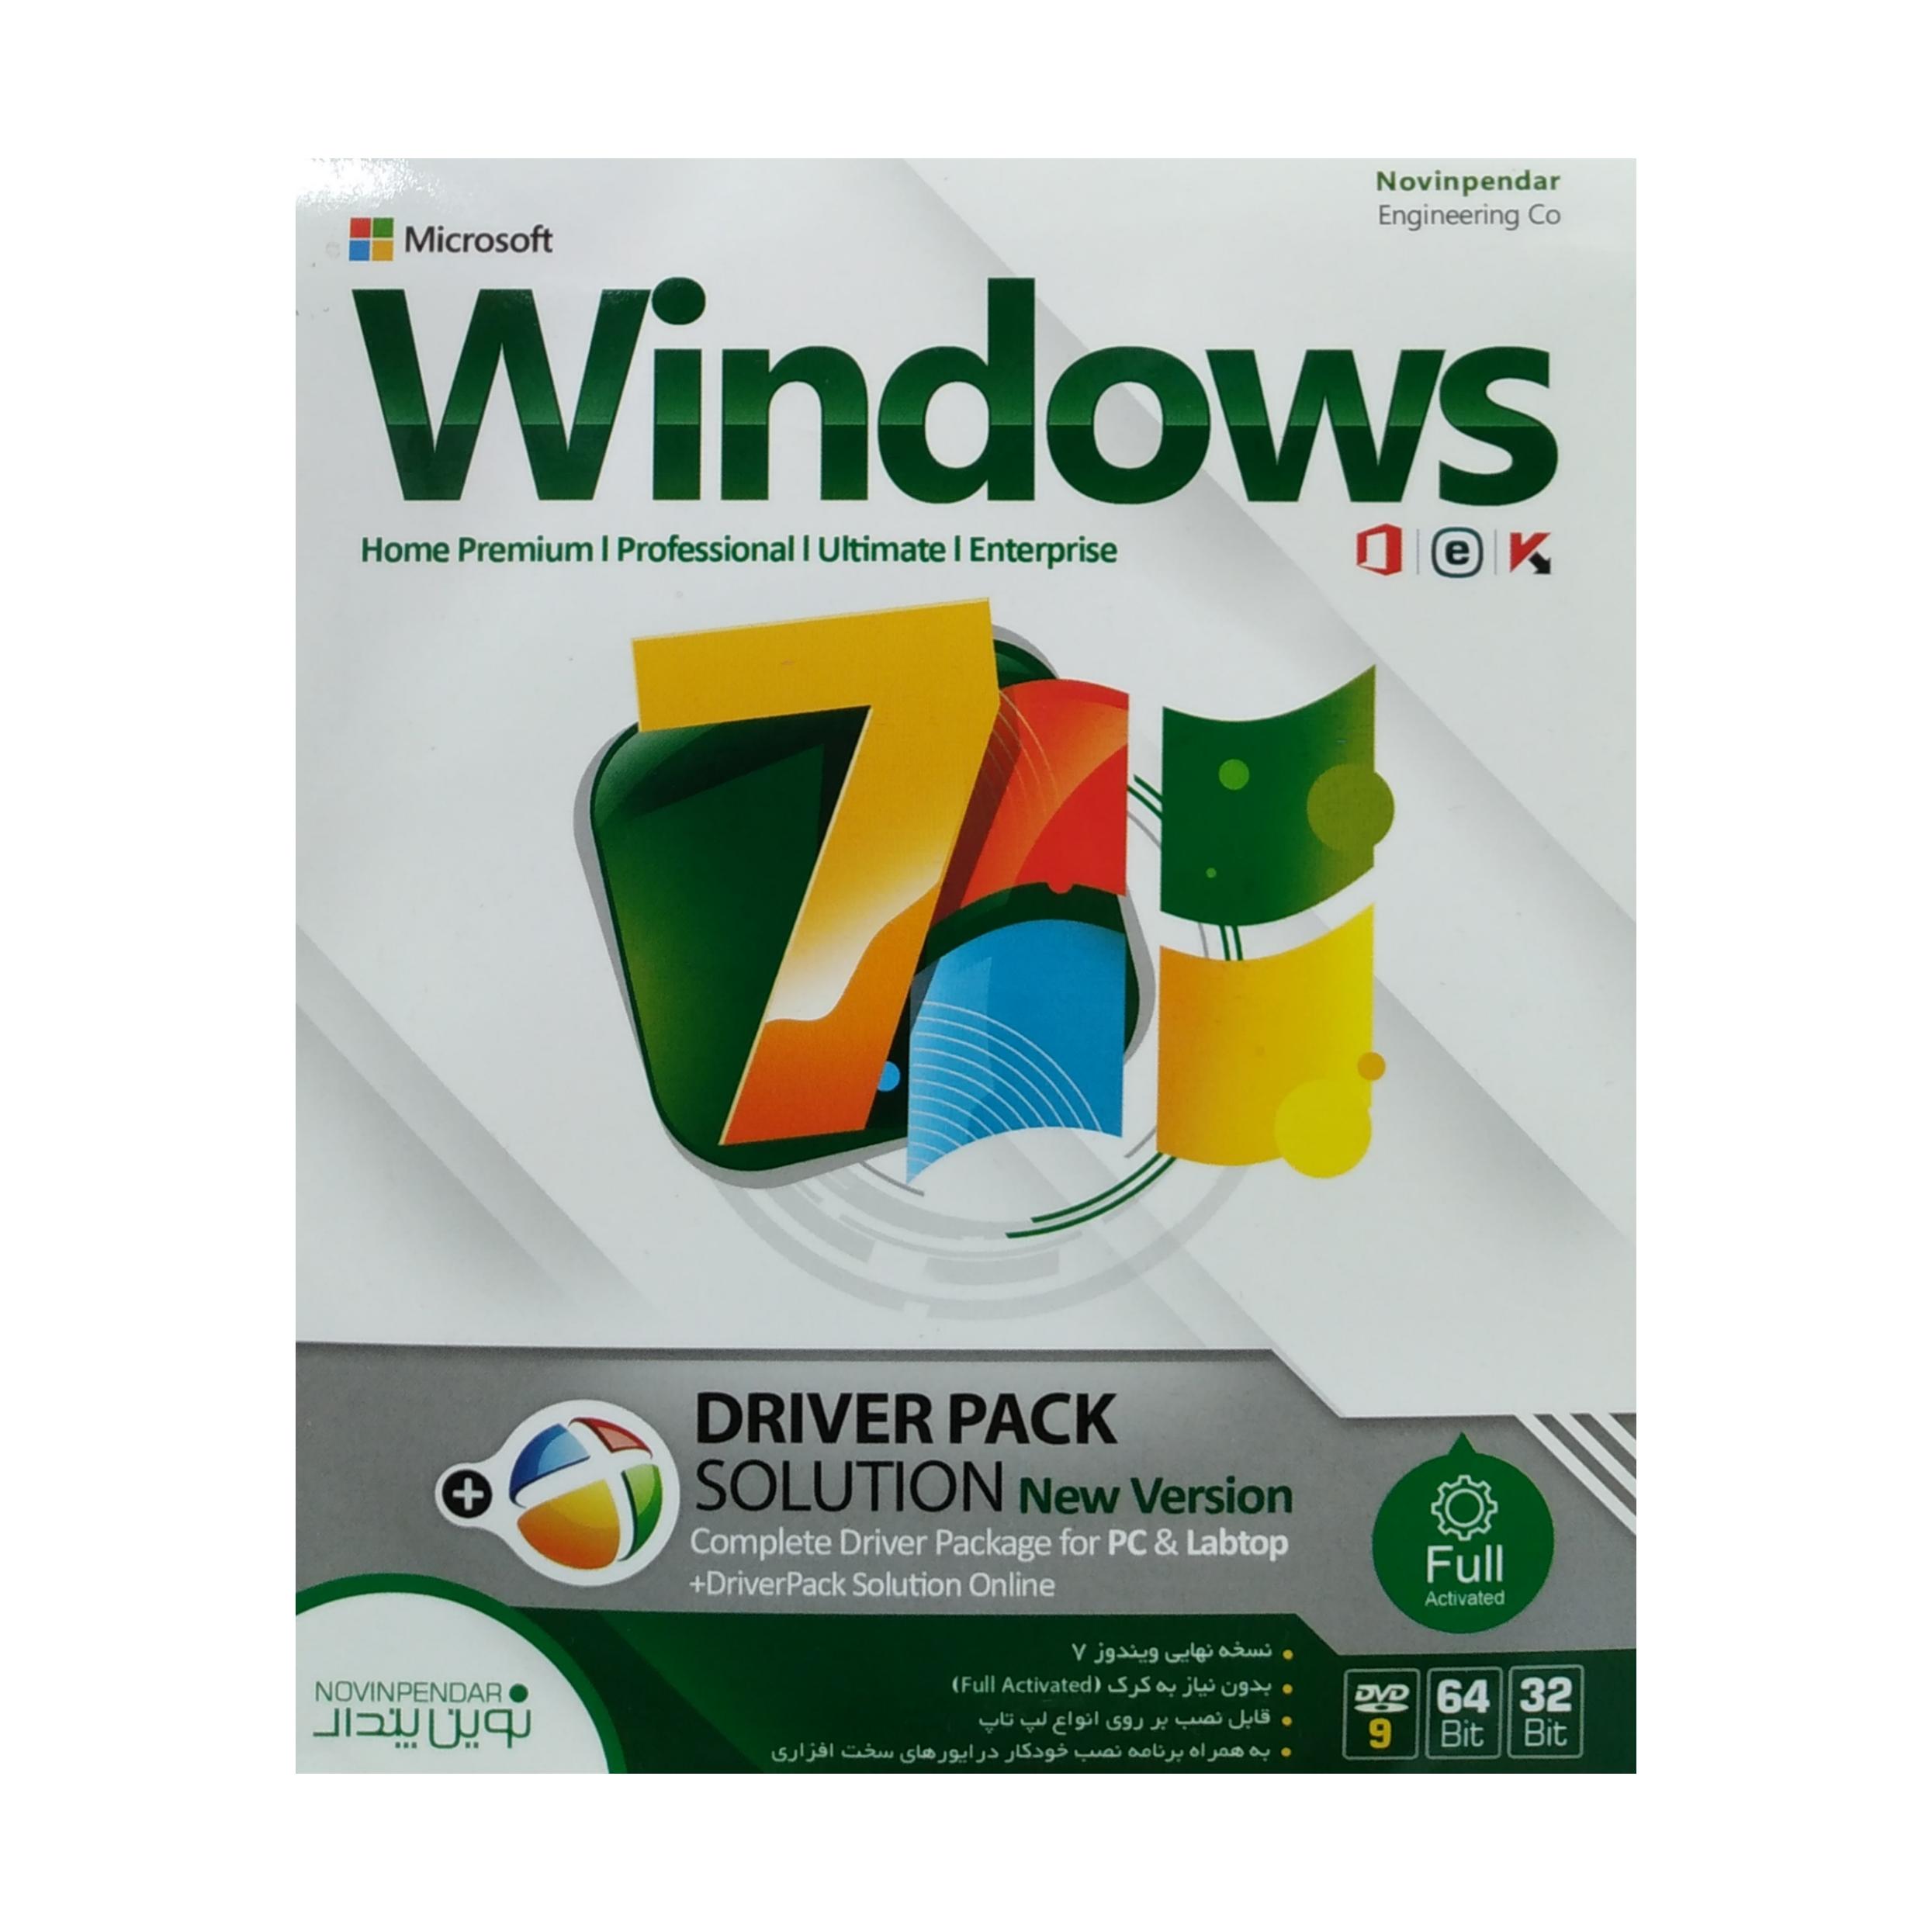 سیستم عامل Windows 7+ Driver Pack Solution New Version نشر نوین پندار